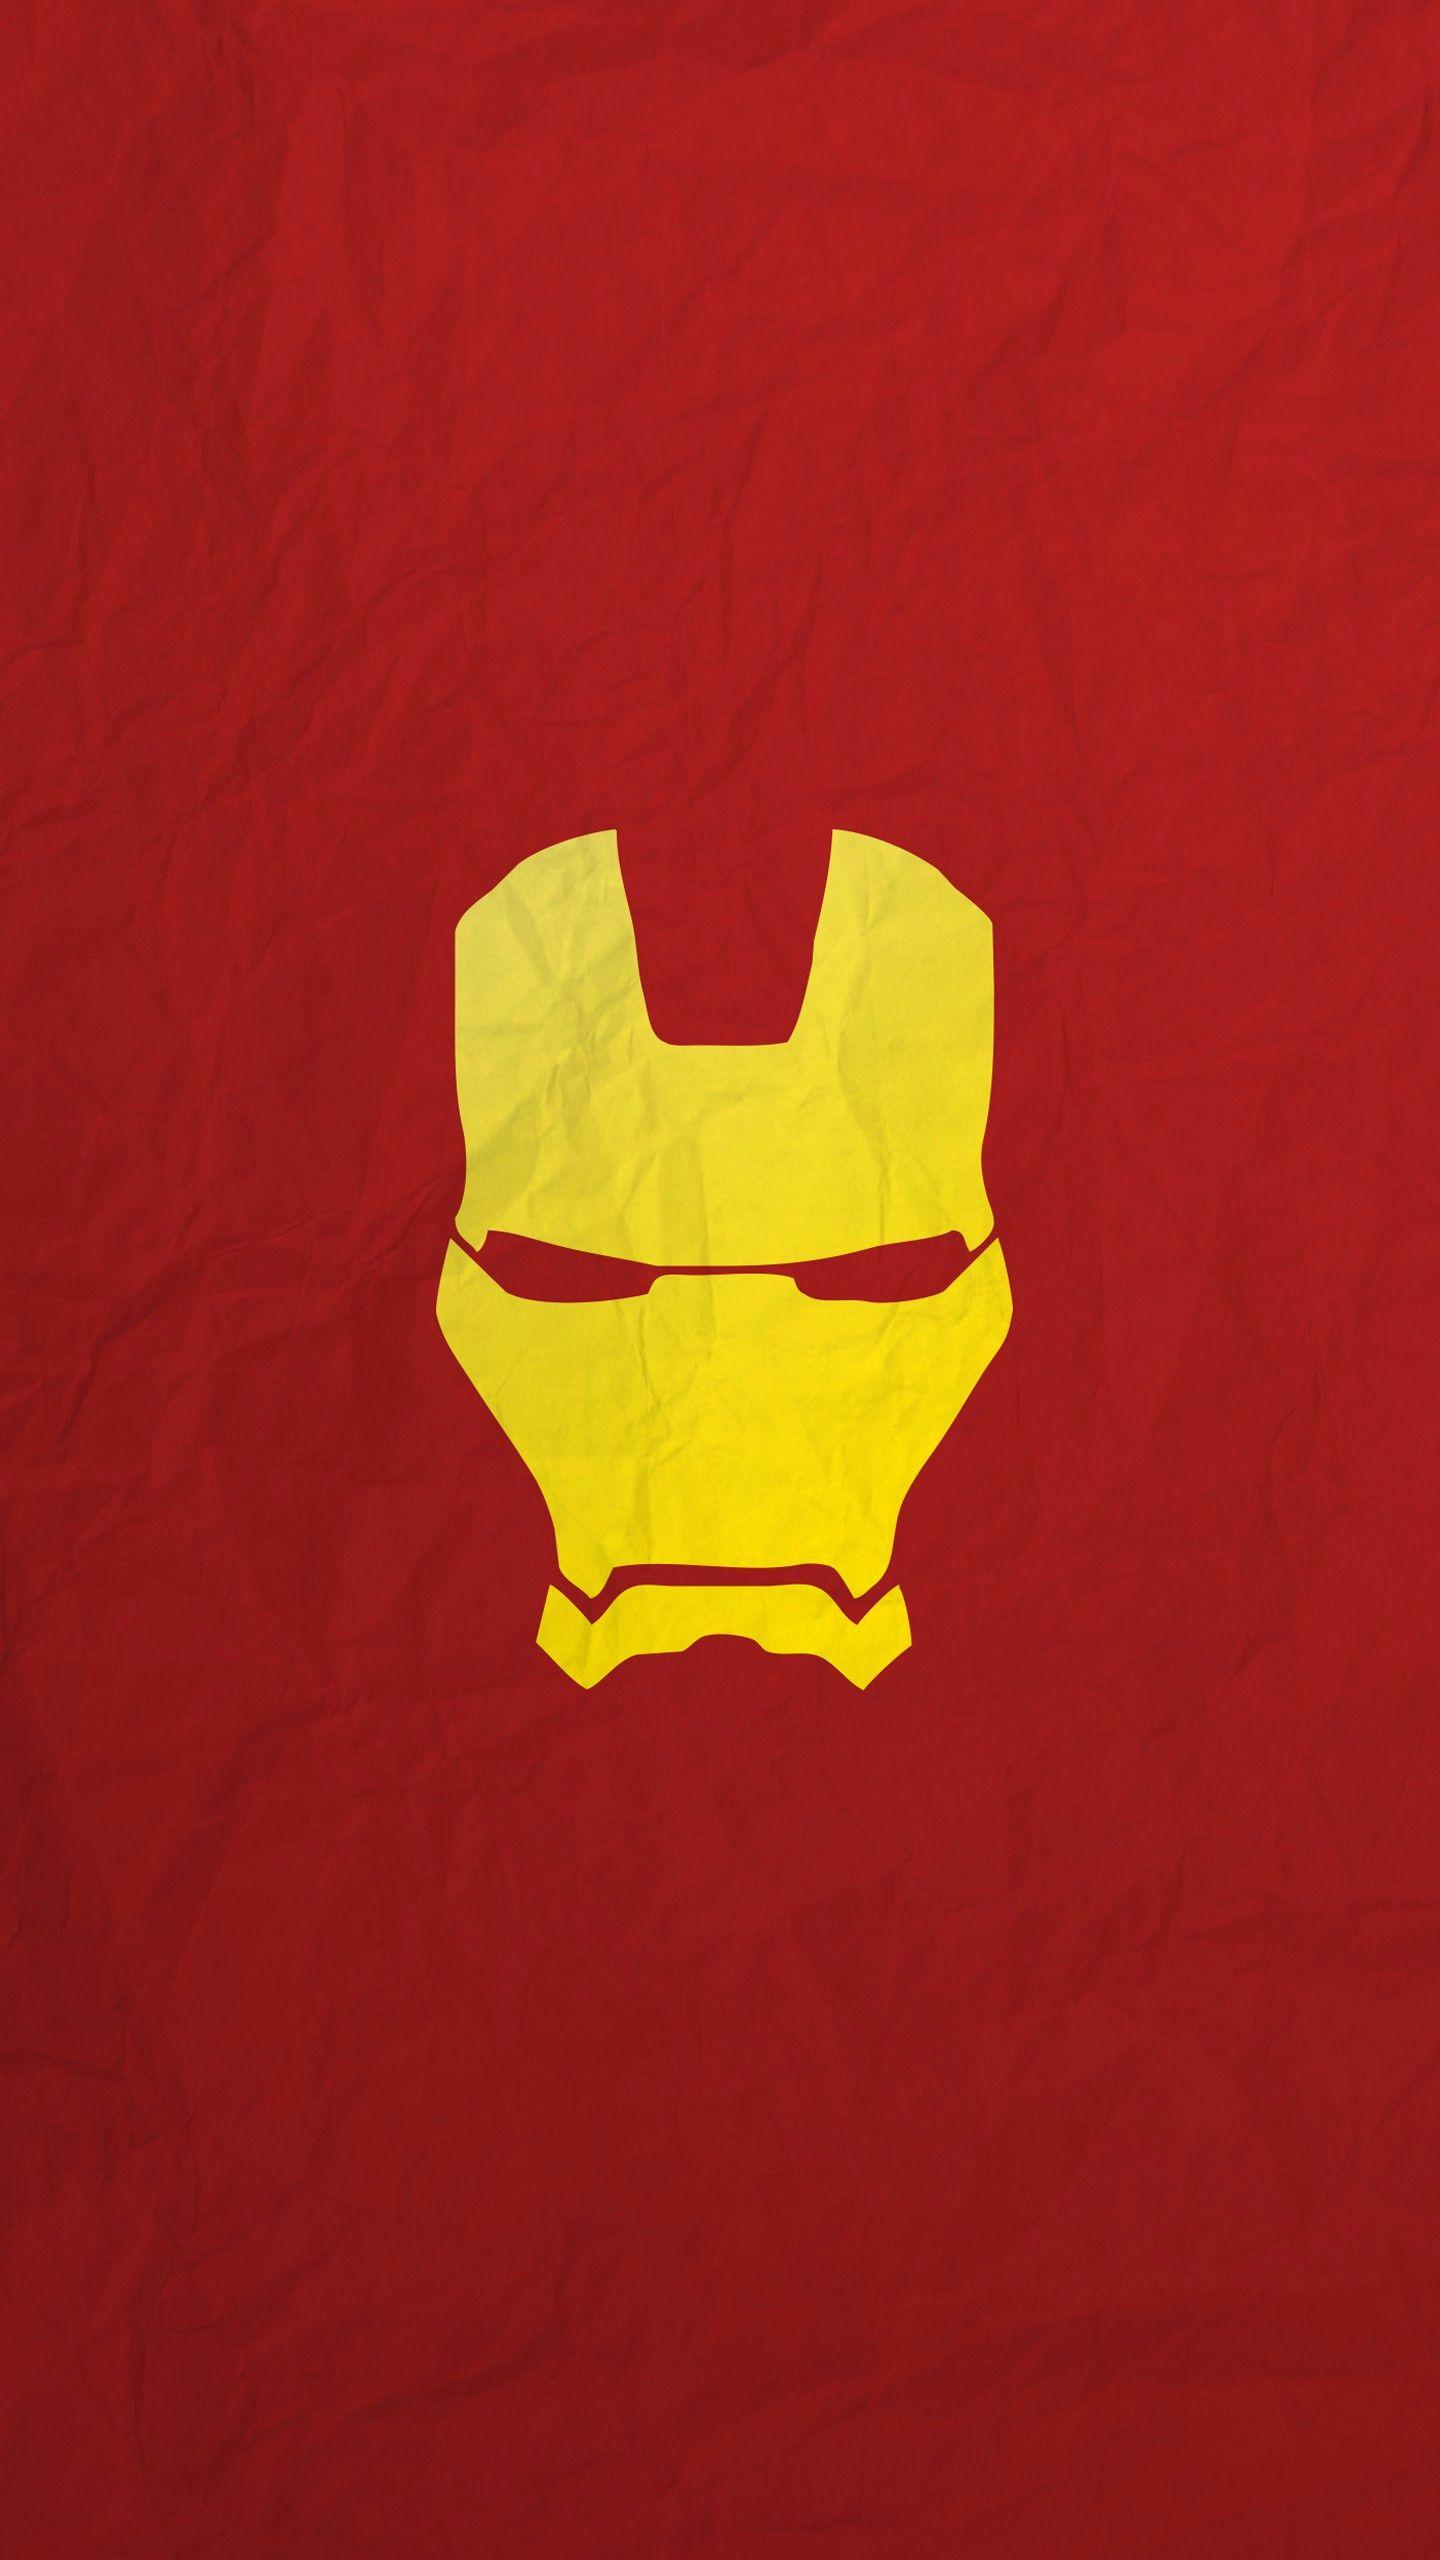 Iron Man 4k Wallpaper Luxury Superhero Wallpapers Hd Superhero